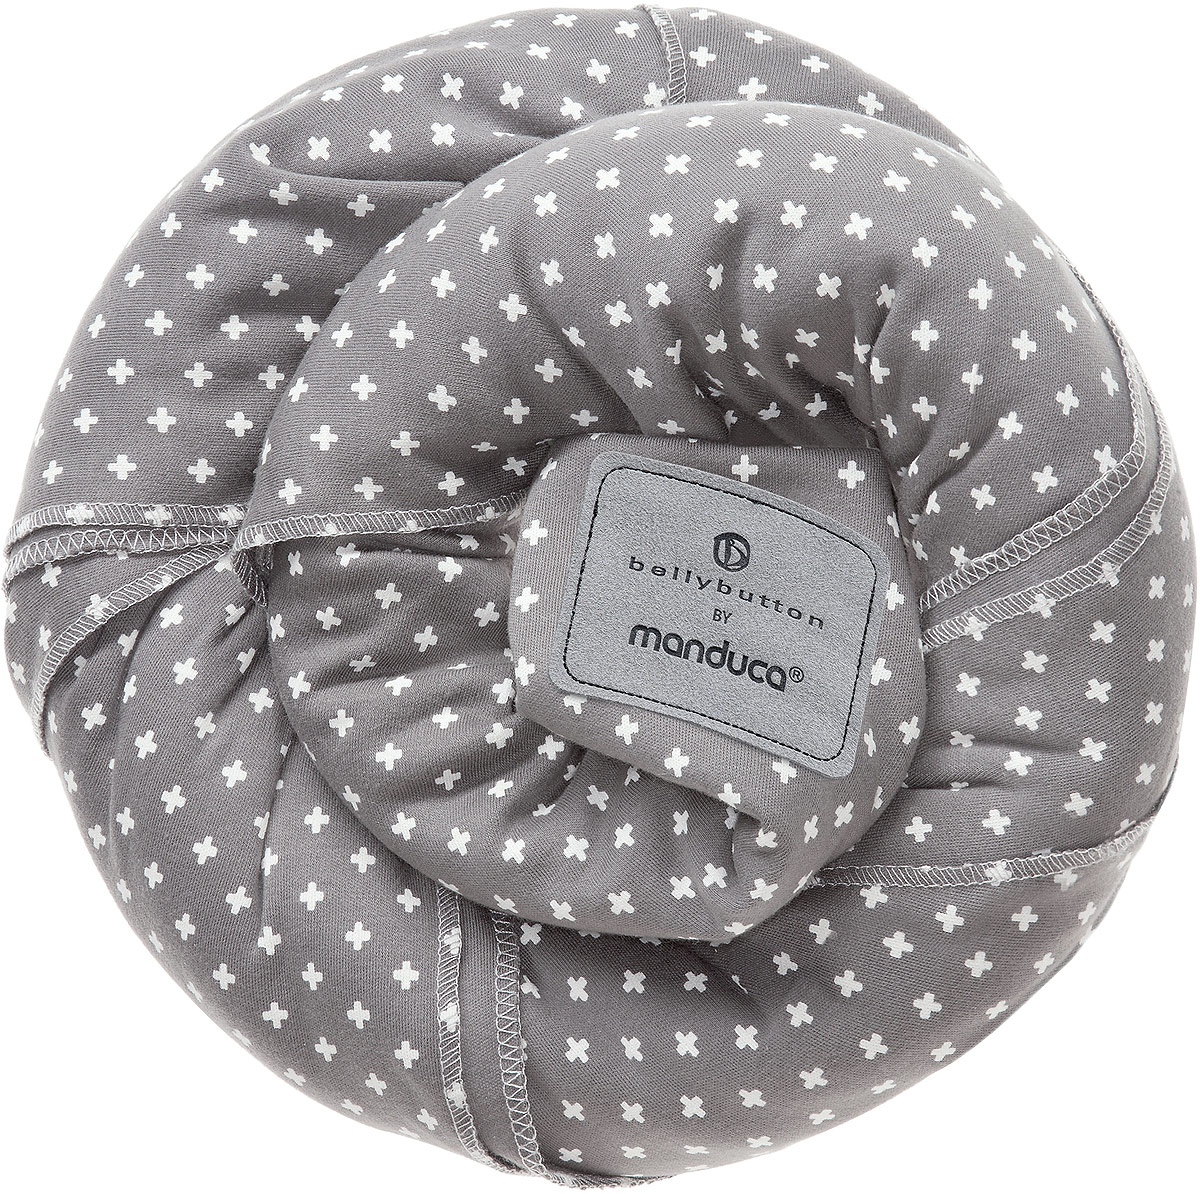 Manduca Слинг-шарф bellybutton WildCrosses цвет серый -  Рюкзаки, слинги, кенгуру